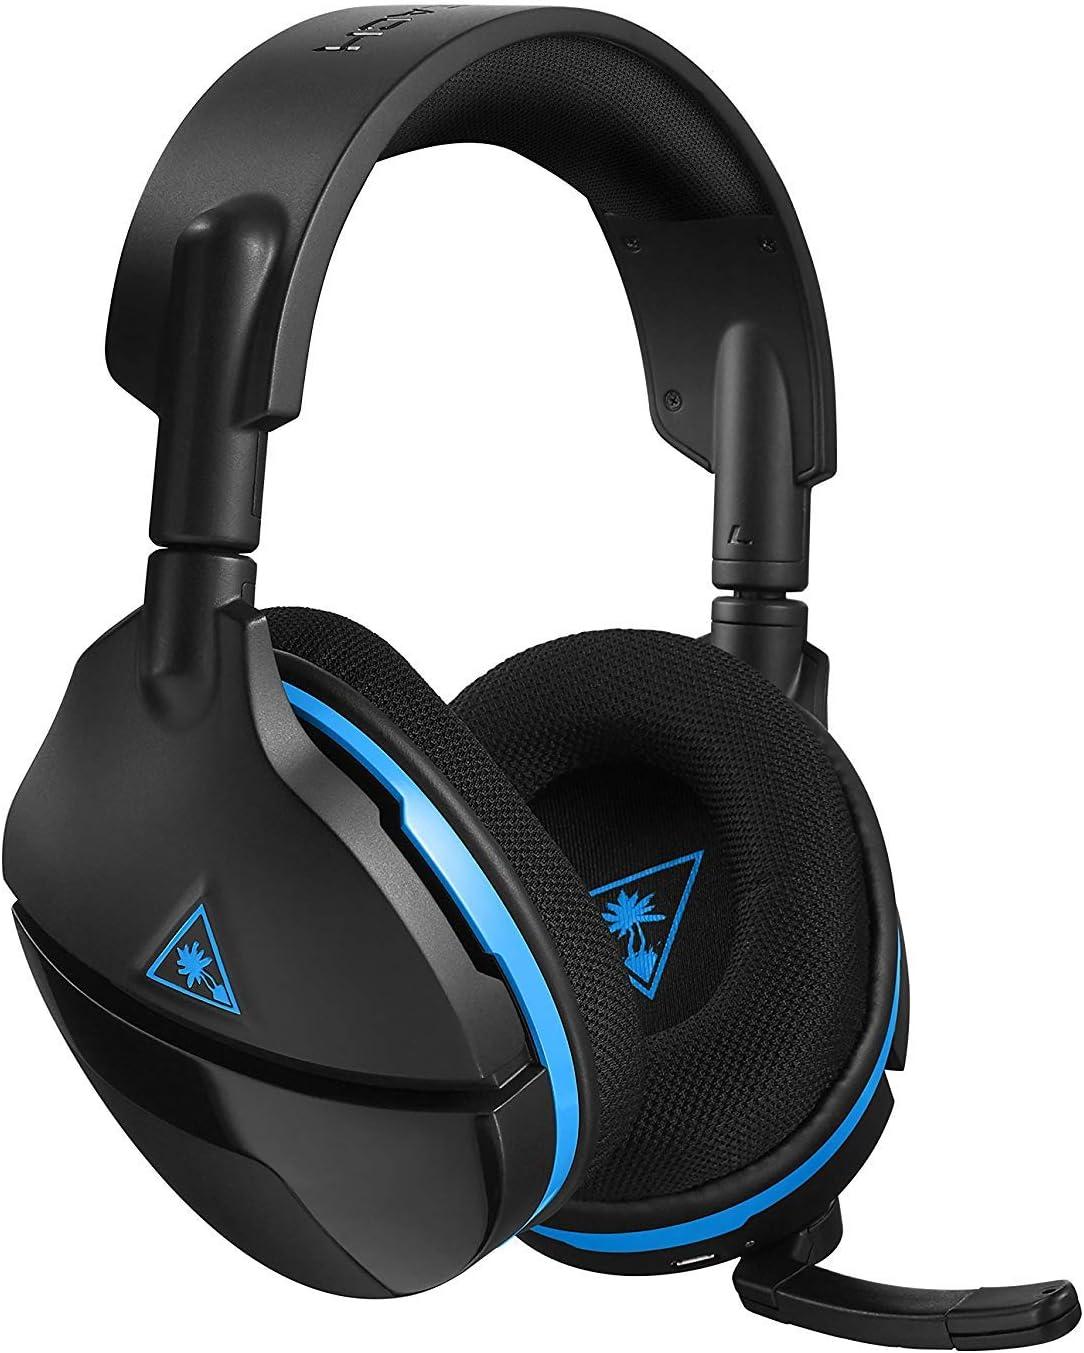 Turtle Beach Stealth 600 - Auriculares gaming con Sonido Envolvente Inalámbricos para PS4